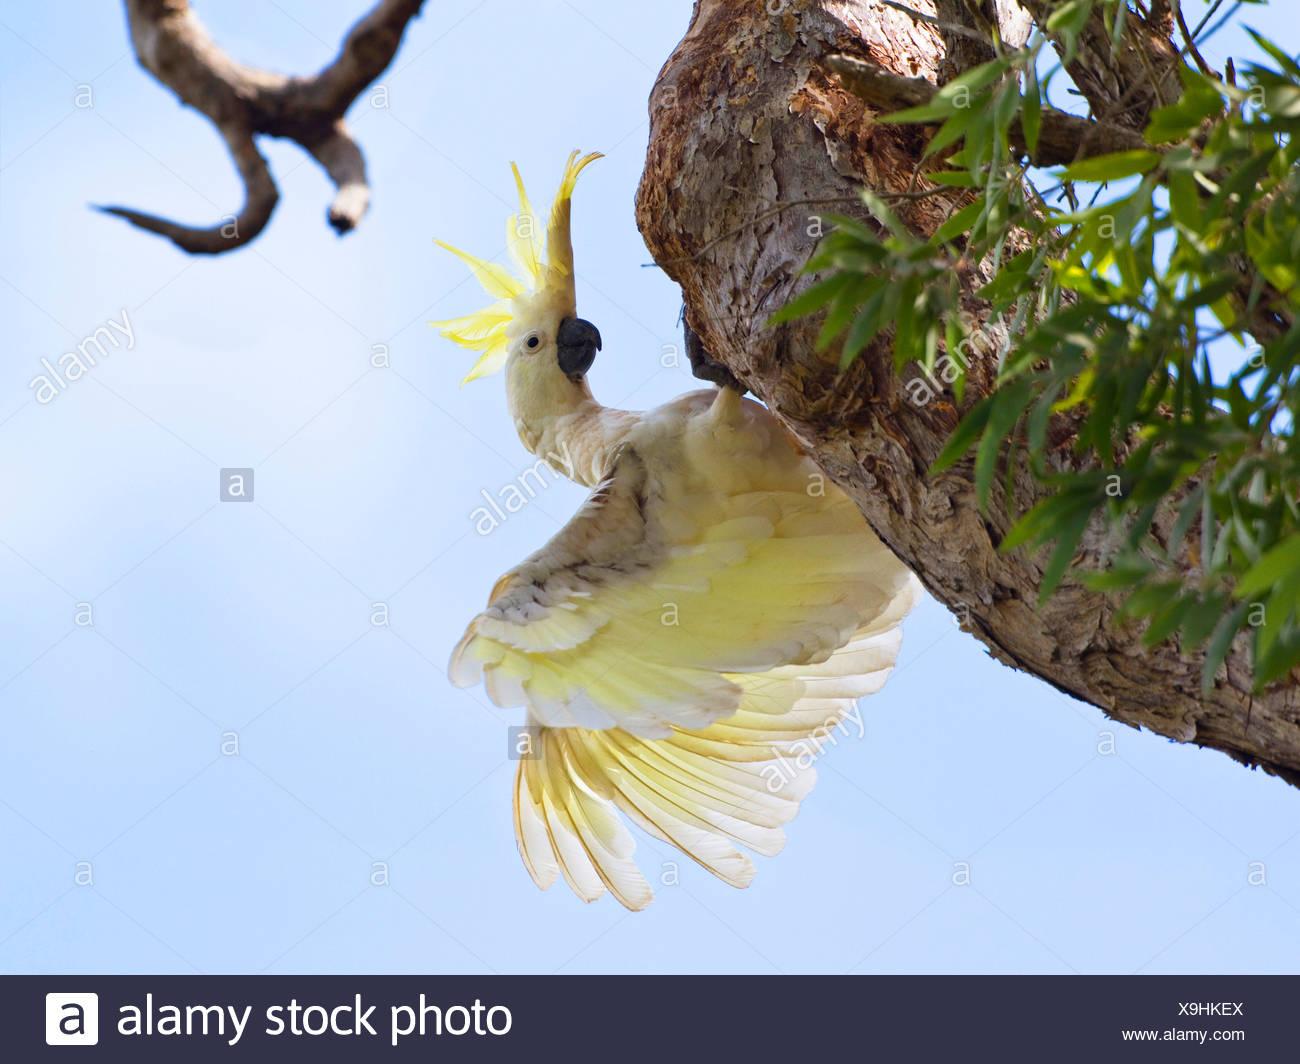 sulphur-crested cockatoo (Cacatua galerita), on a branch, Australia, Queensland, Cape York peninsula, Iron Range National Park - Stock Image